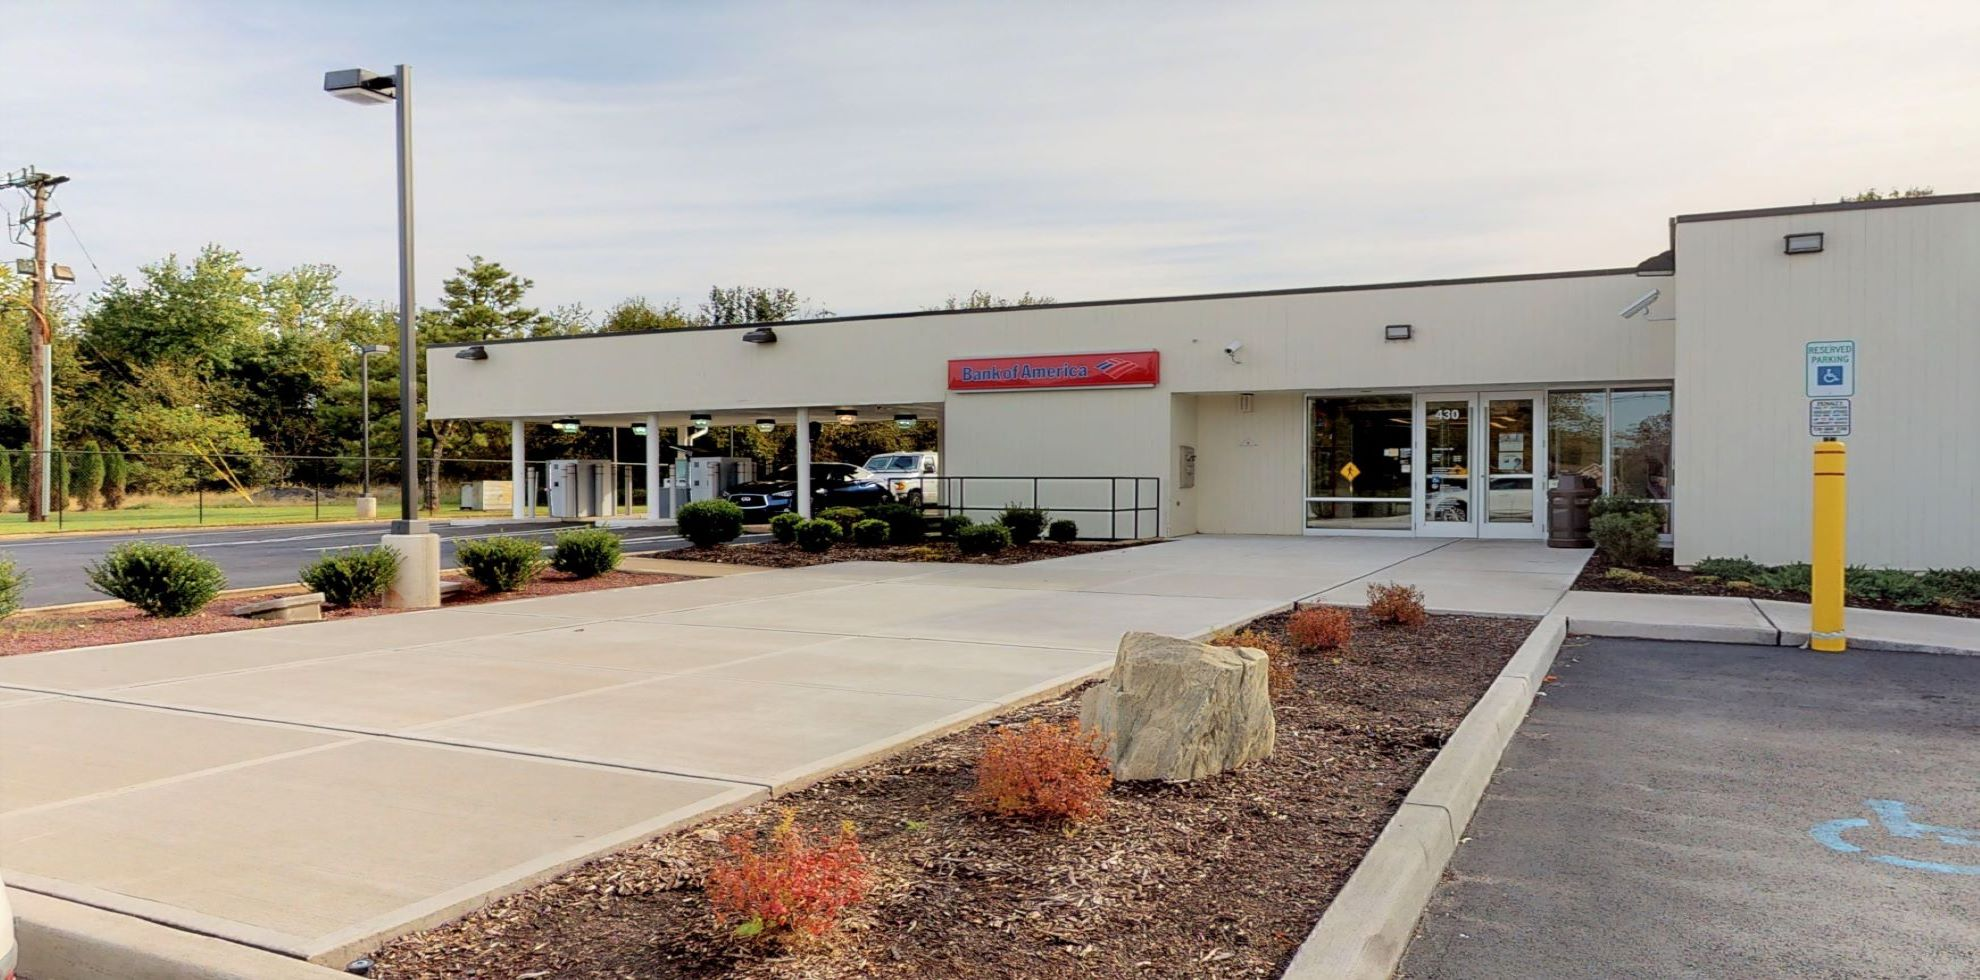 Bank of America financial center with drive-thru ATM | 430 Amwell Rd, Hillsborough, NJ 08844